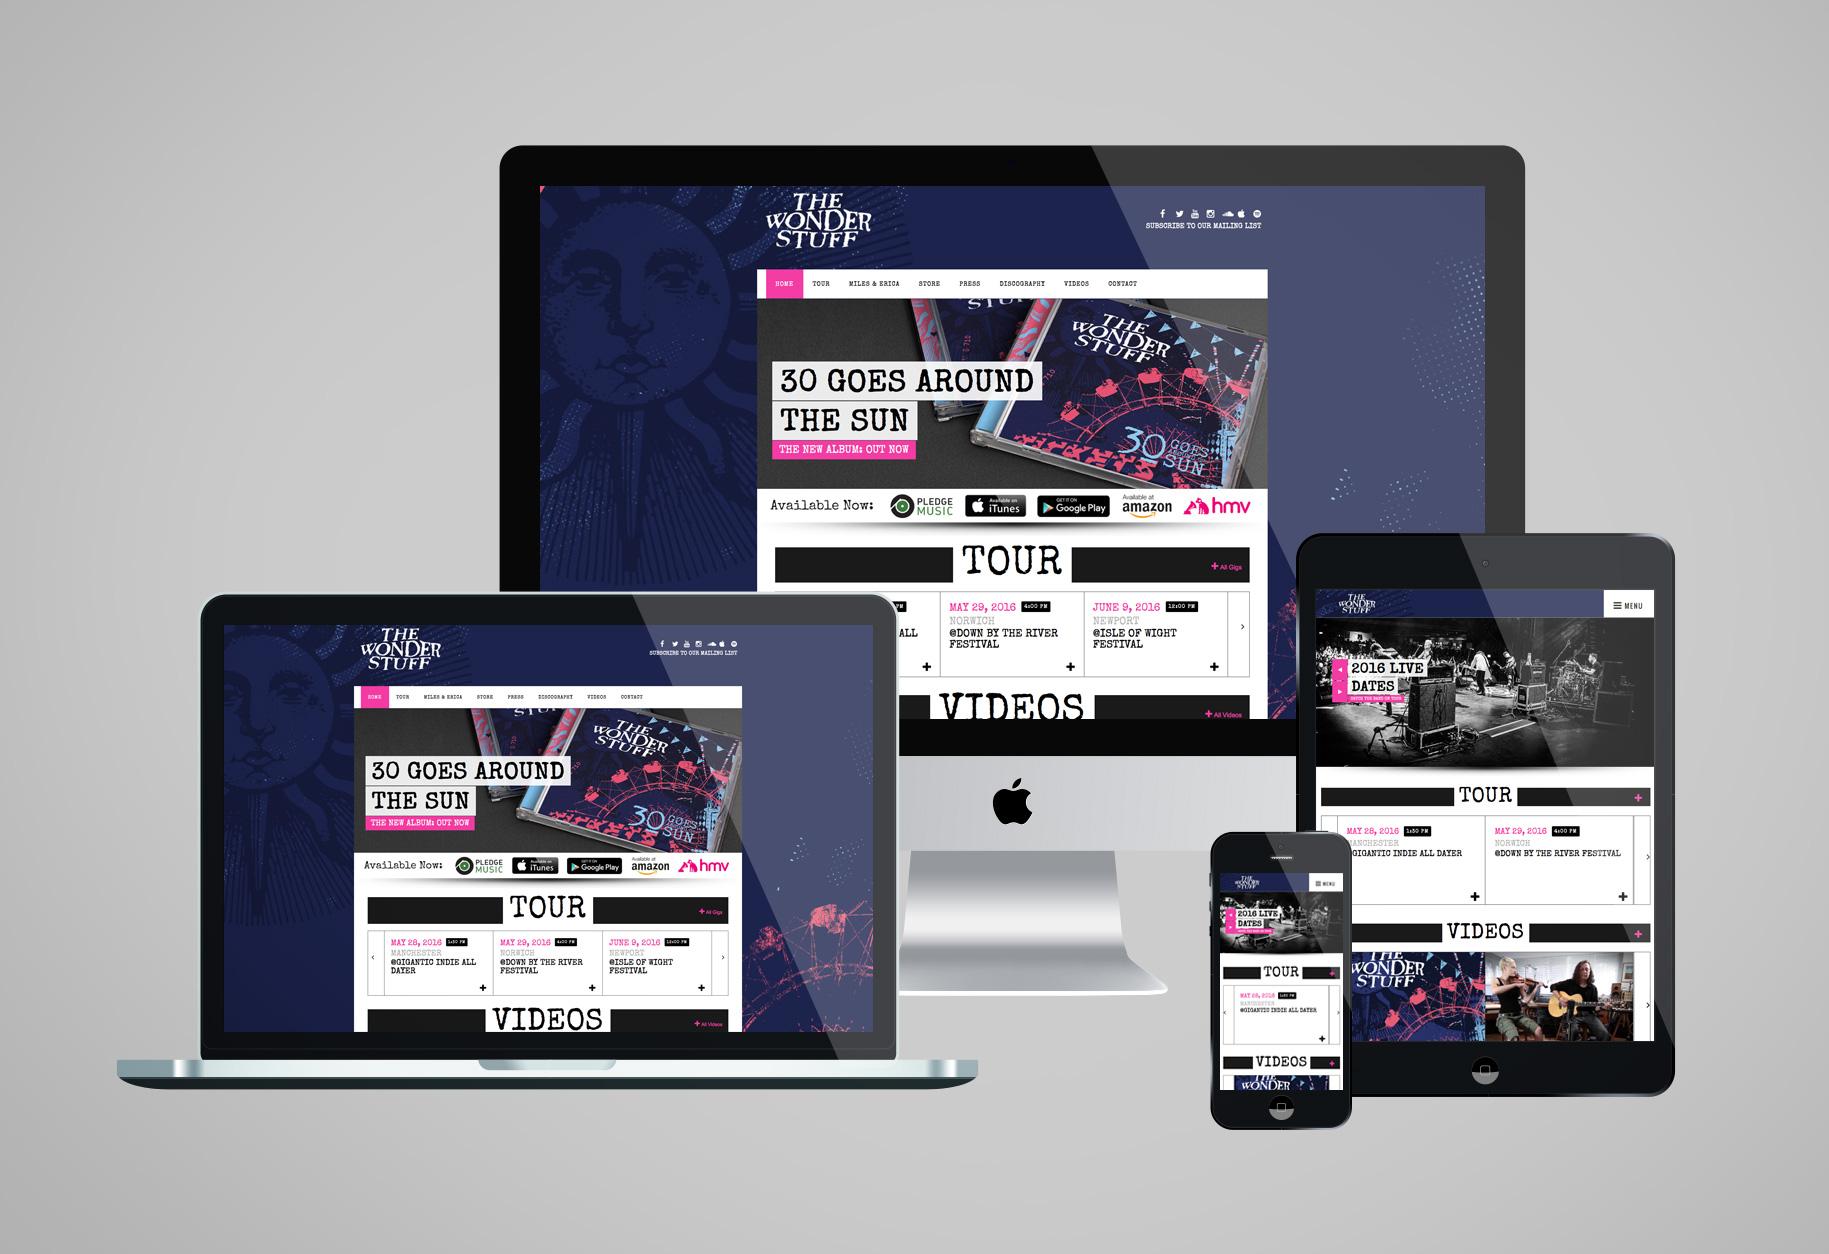 New website for The Wonder Stuff